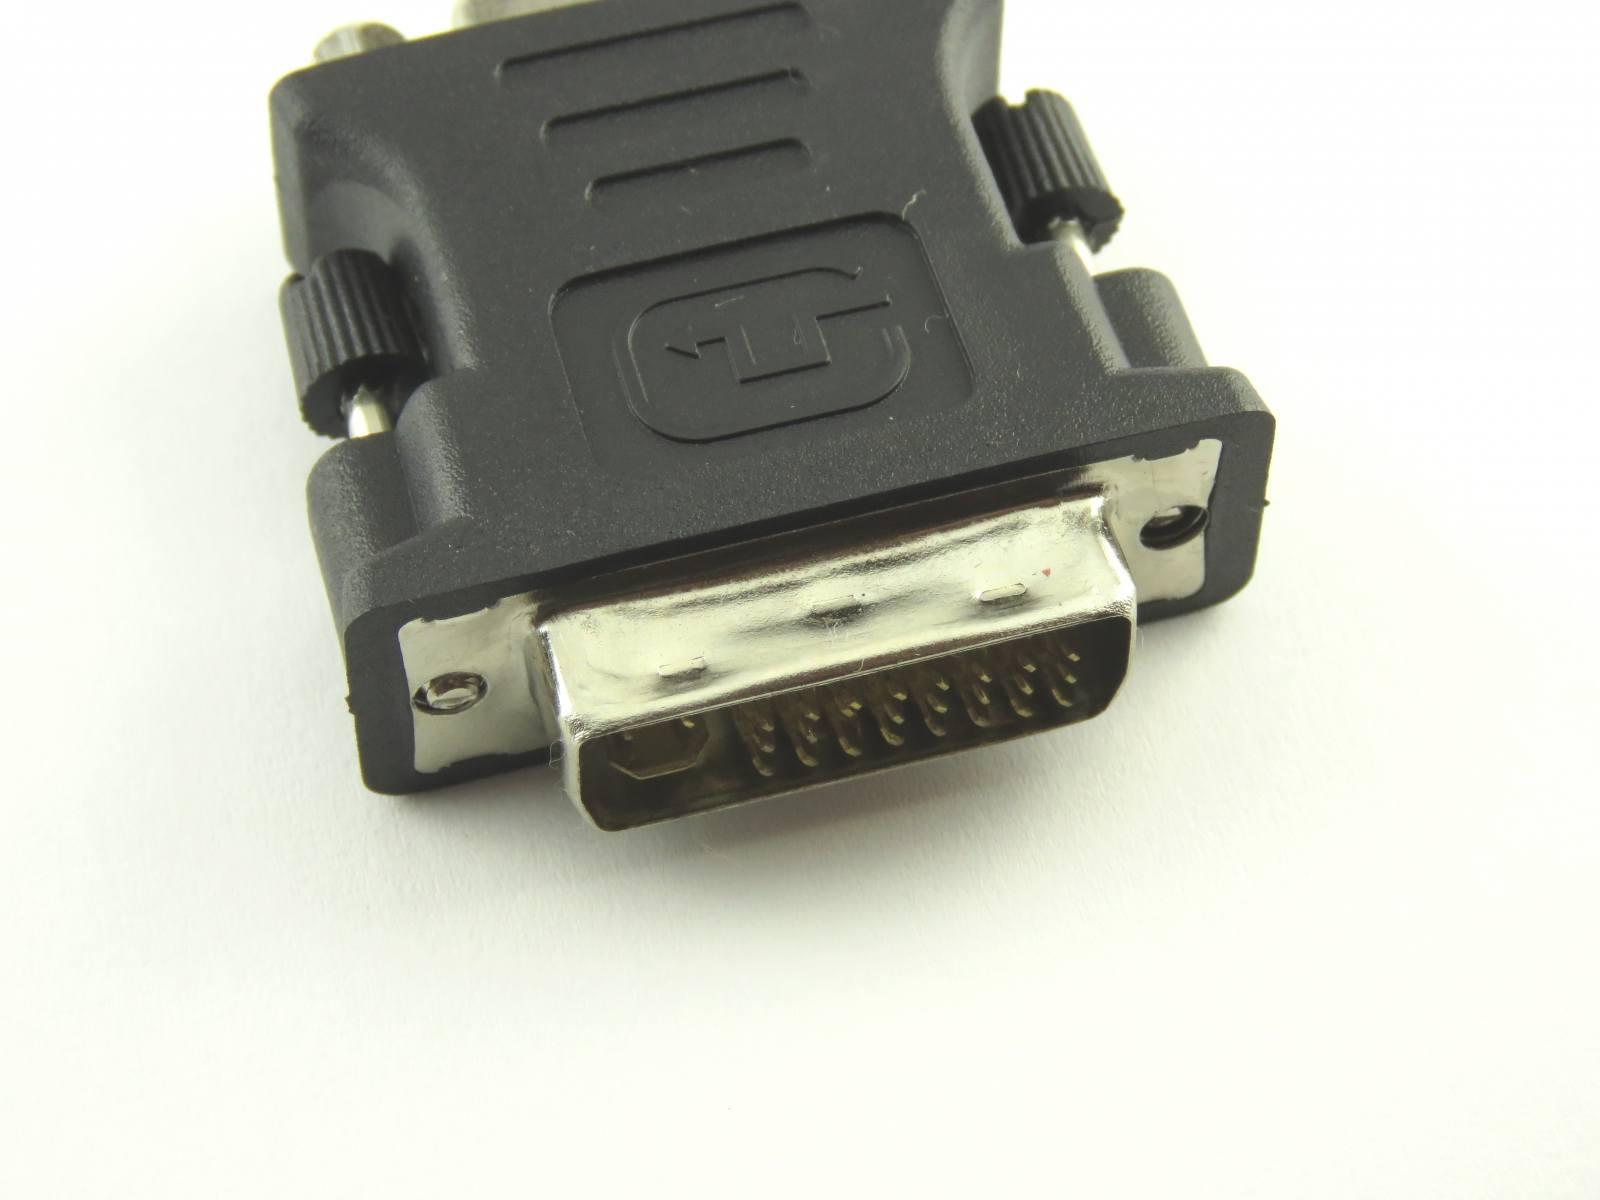 Adaptateur DVI GC-DVIM15F-HD (image 3/4)